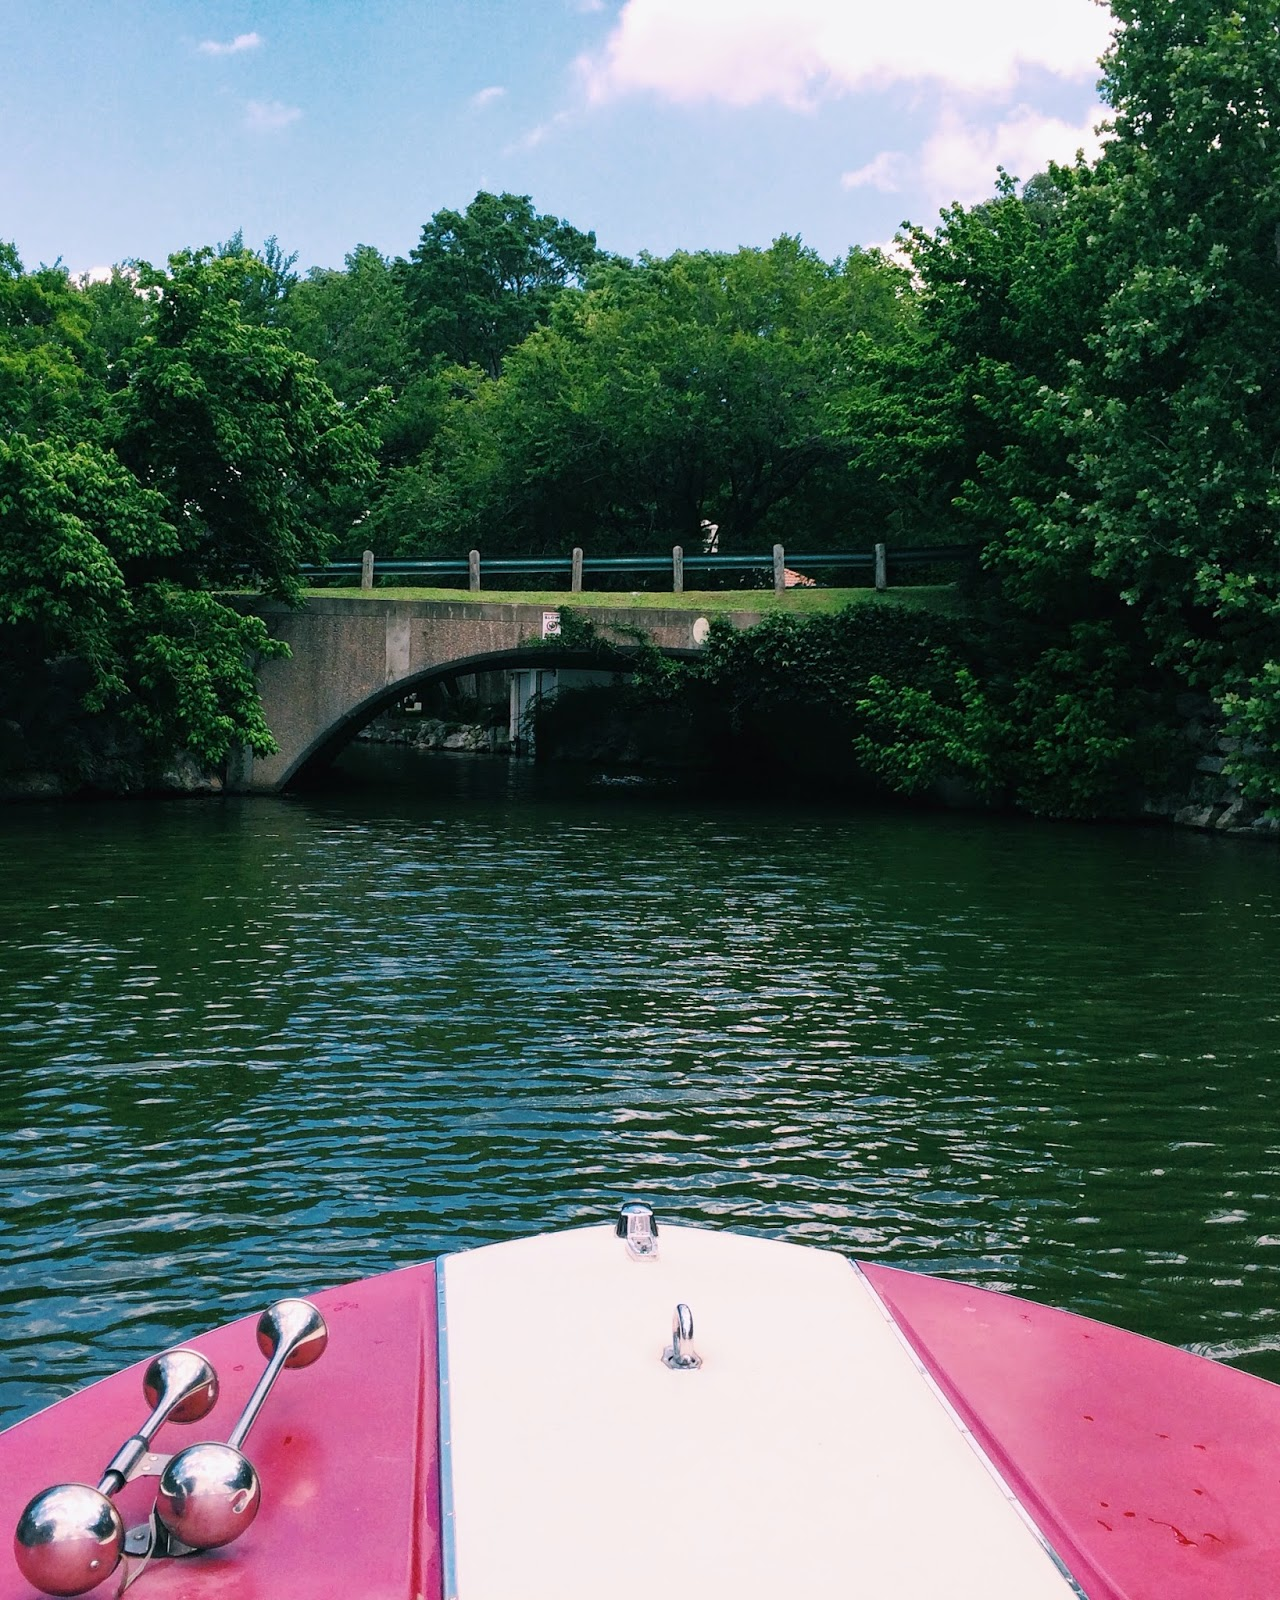 Lake Austin, Lake Austin Texas, Lone Star State, Austin TX, Austin Texas, Moat, Lake House, Lake Austin Houses, Bridge, Lake Austin Waterway